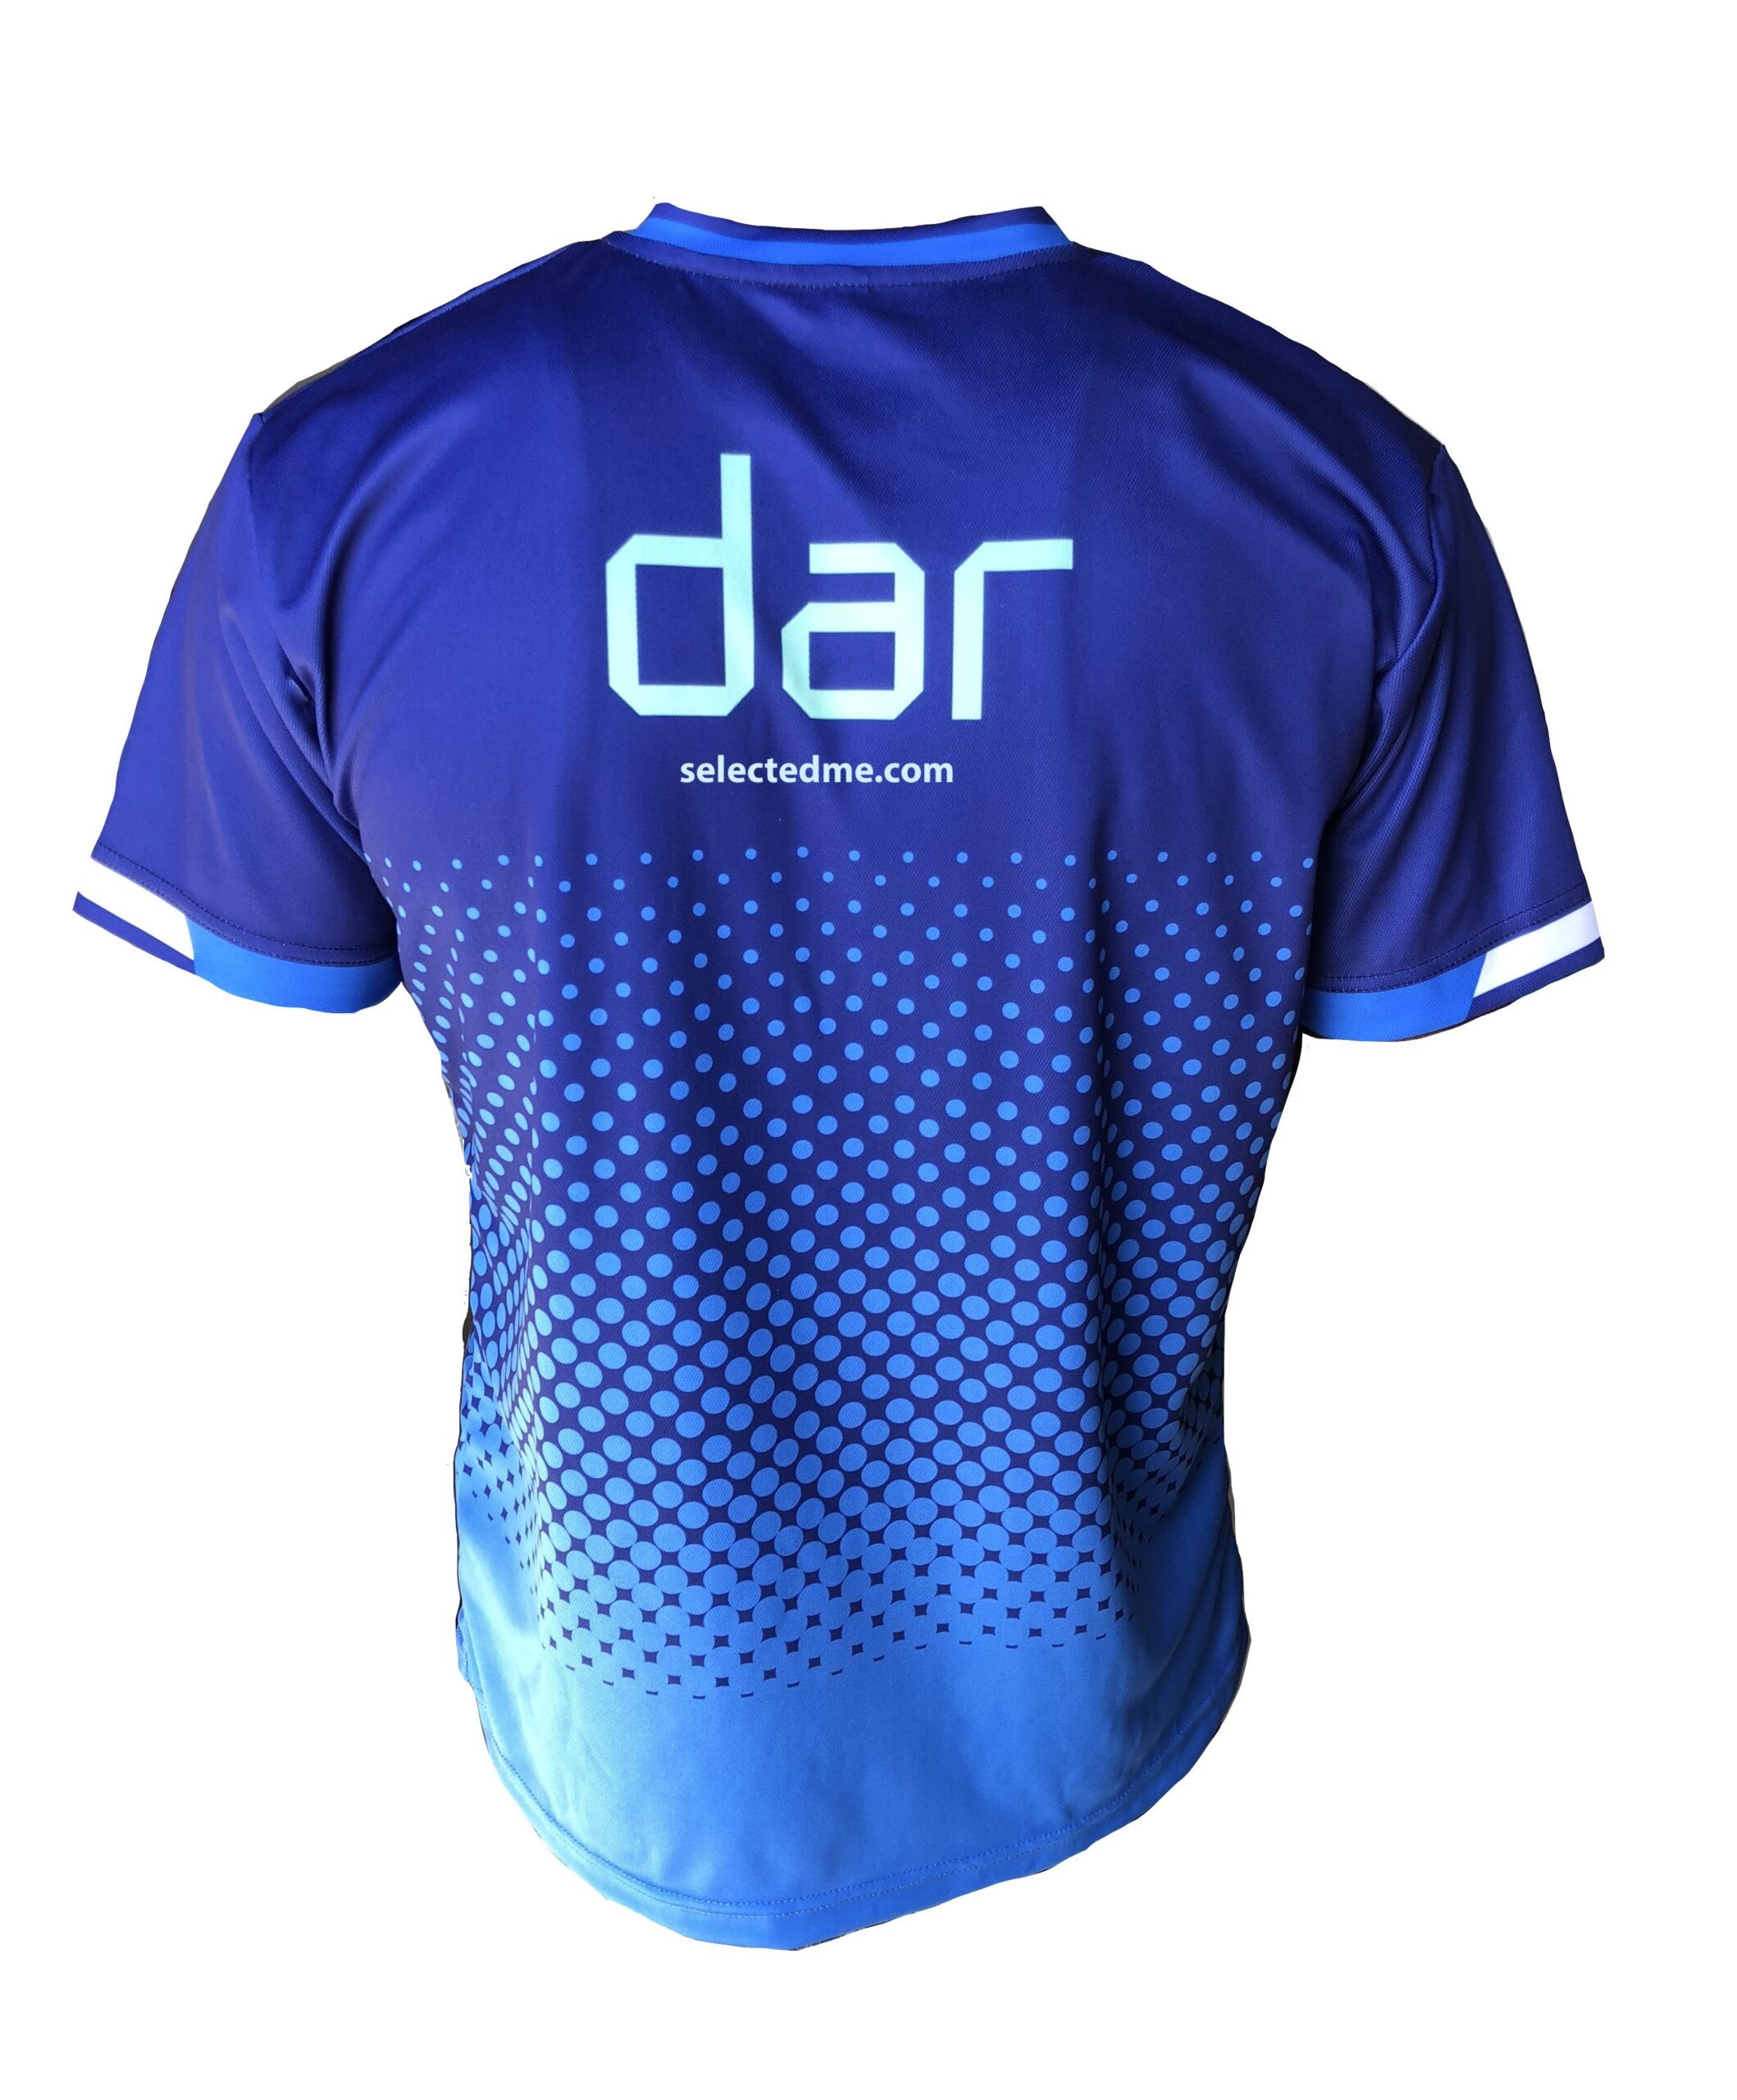 Team Uniforms - Digital Printed Team Jerseys, Sublimated Jerseys